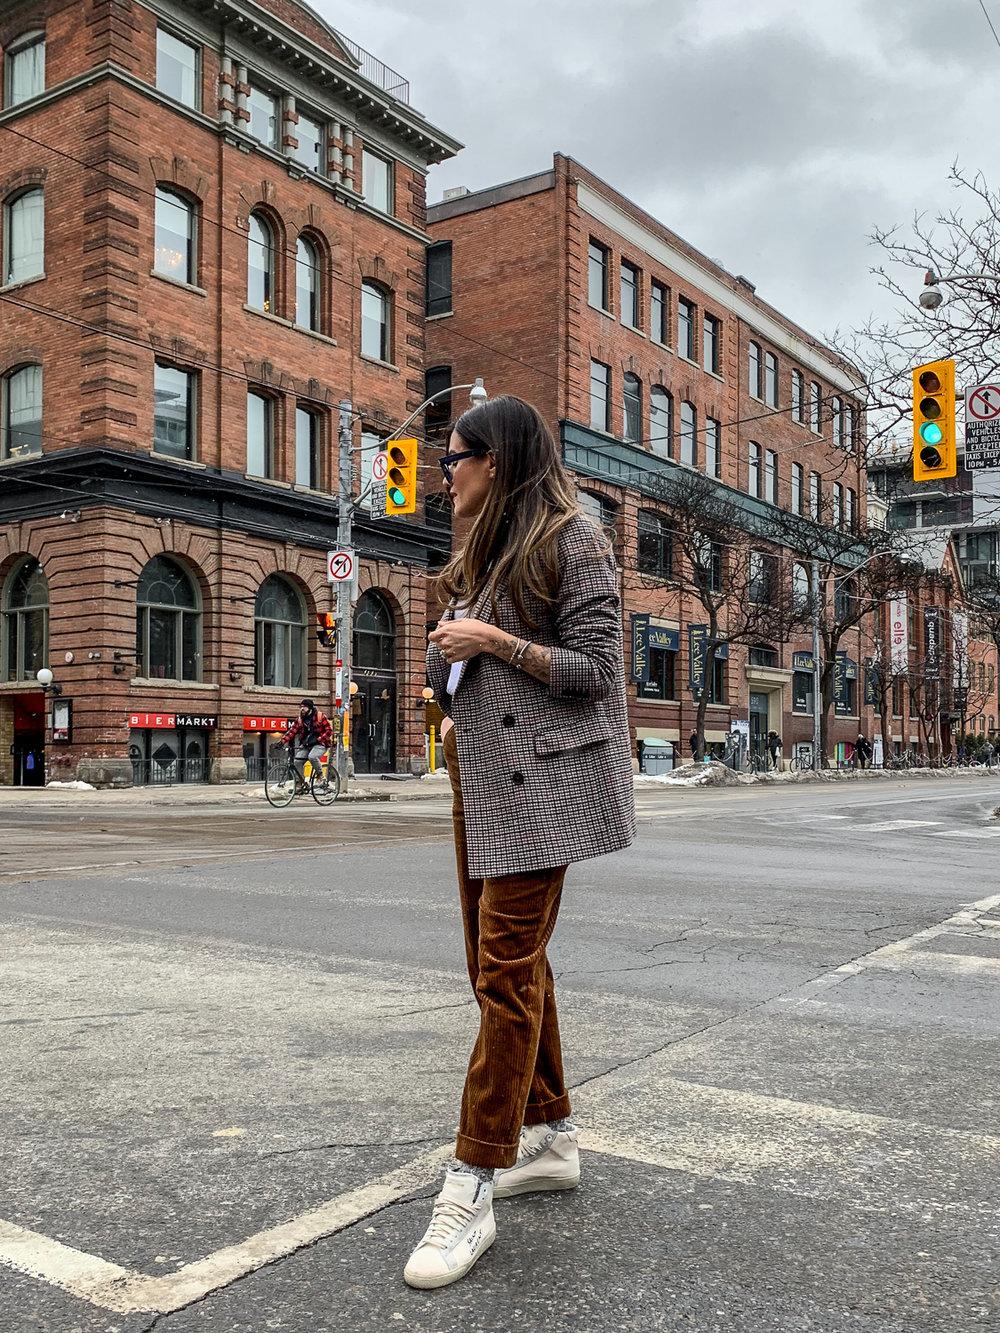 nathalie martin, brown corduroy pants, sandro paris t-shirt, frank and oak brown plaid oversized blazer, saint laurent high top canvas sneakers, woahstyle.com, street style_5192.jpg